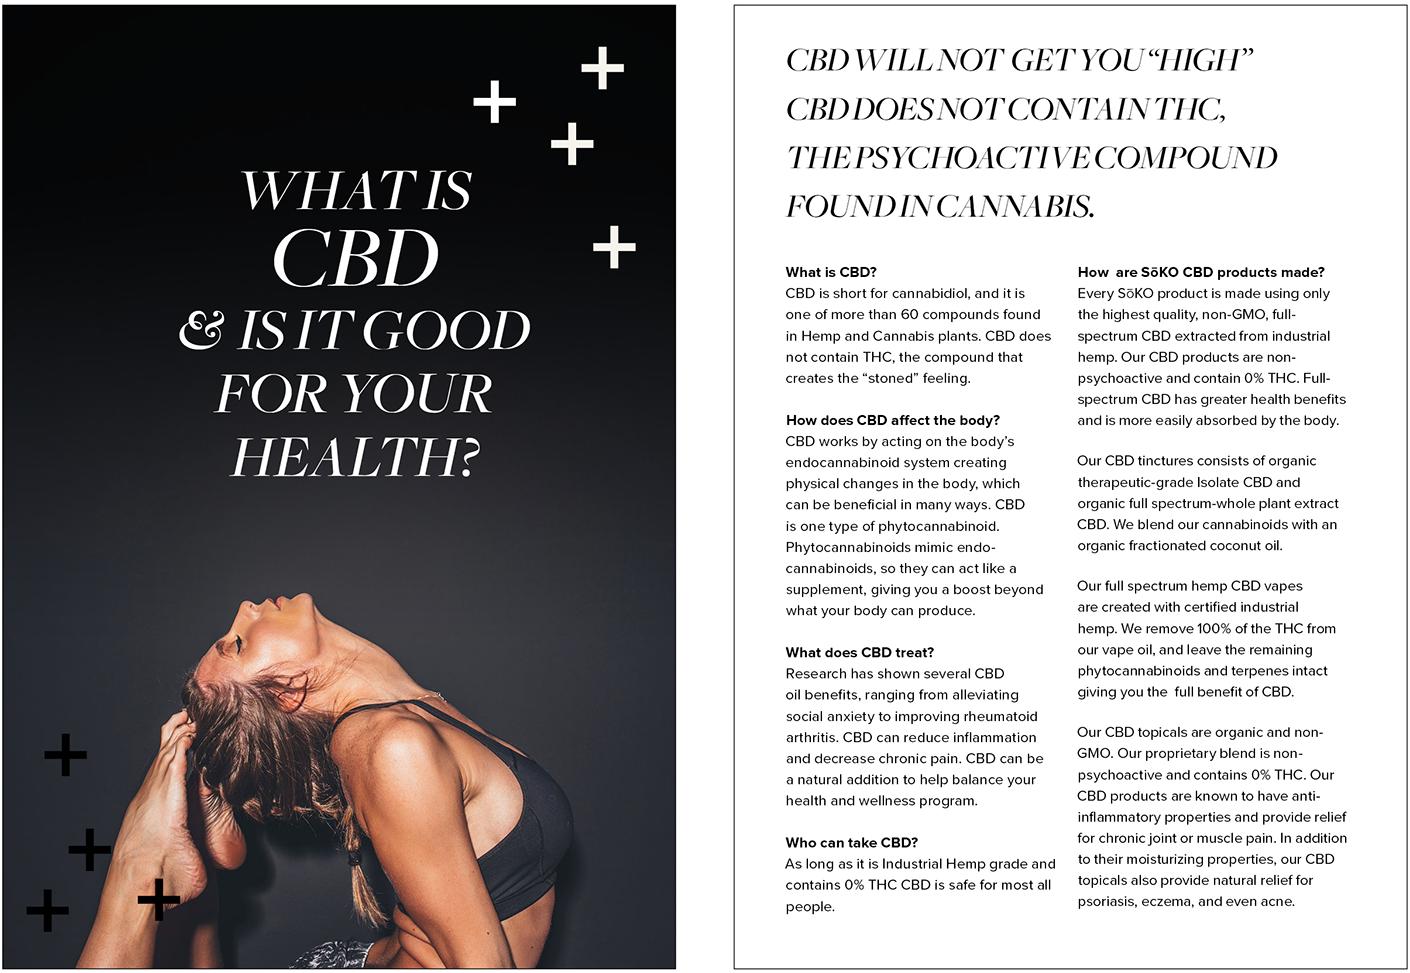 health-benefits-of-cbd